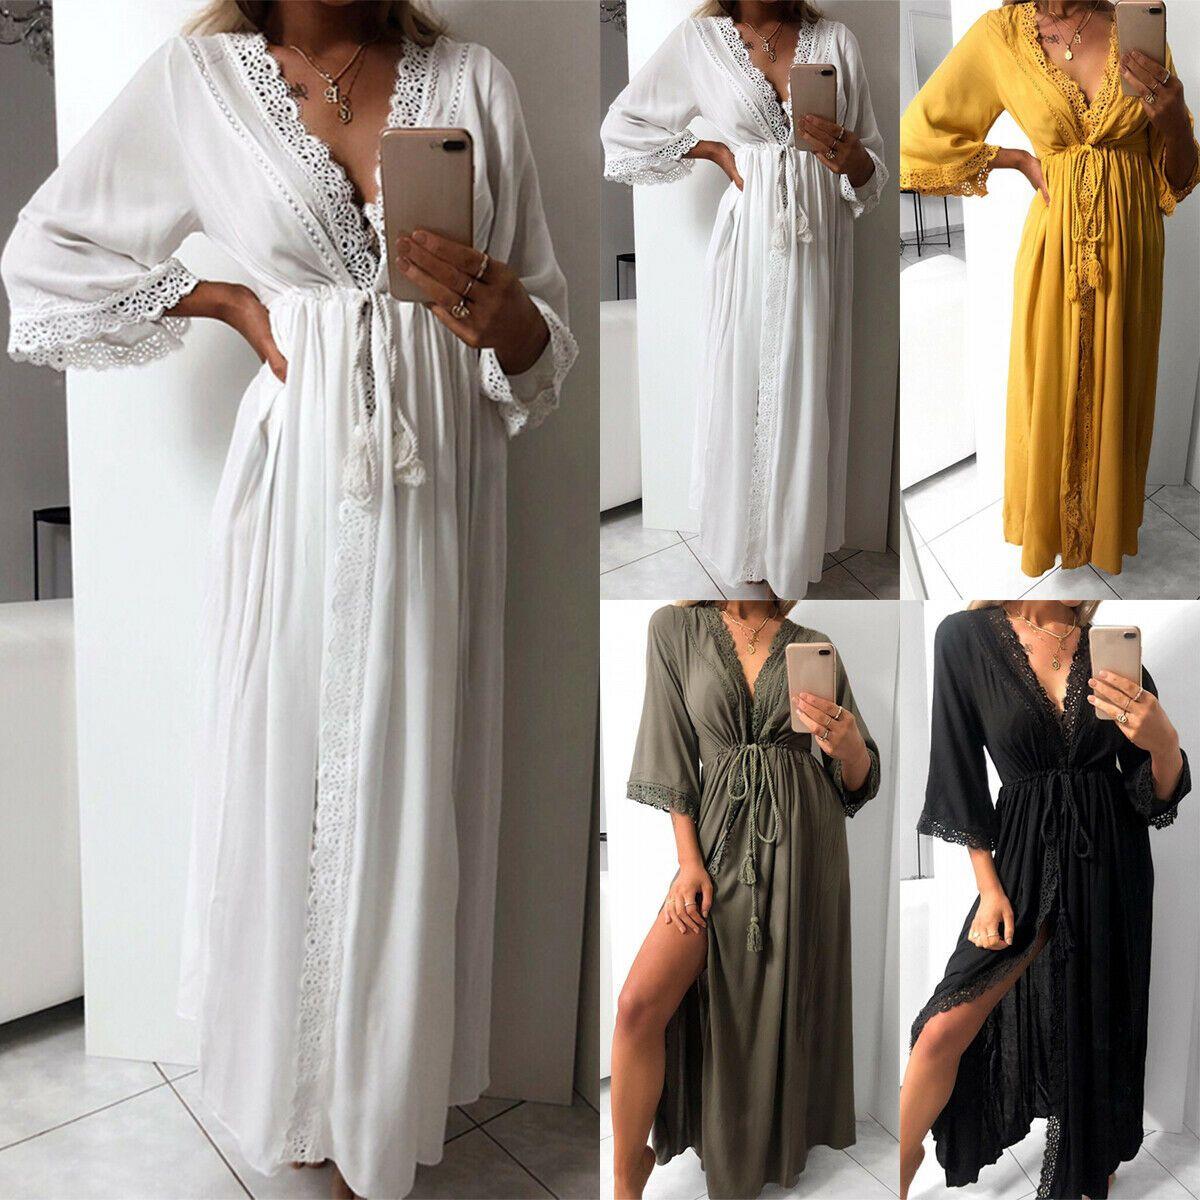 buy popular 24432 7912f Damen Spitze Wickelkleid Lang Strandkleid Kimono Sommekleid ...